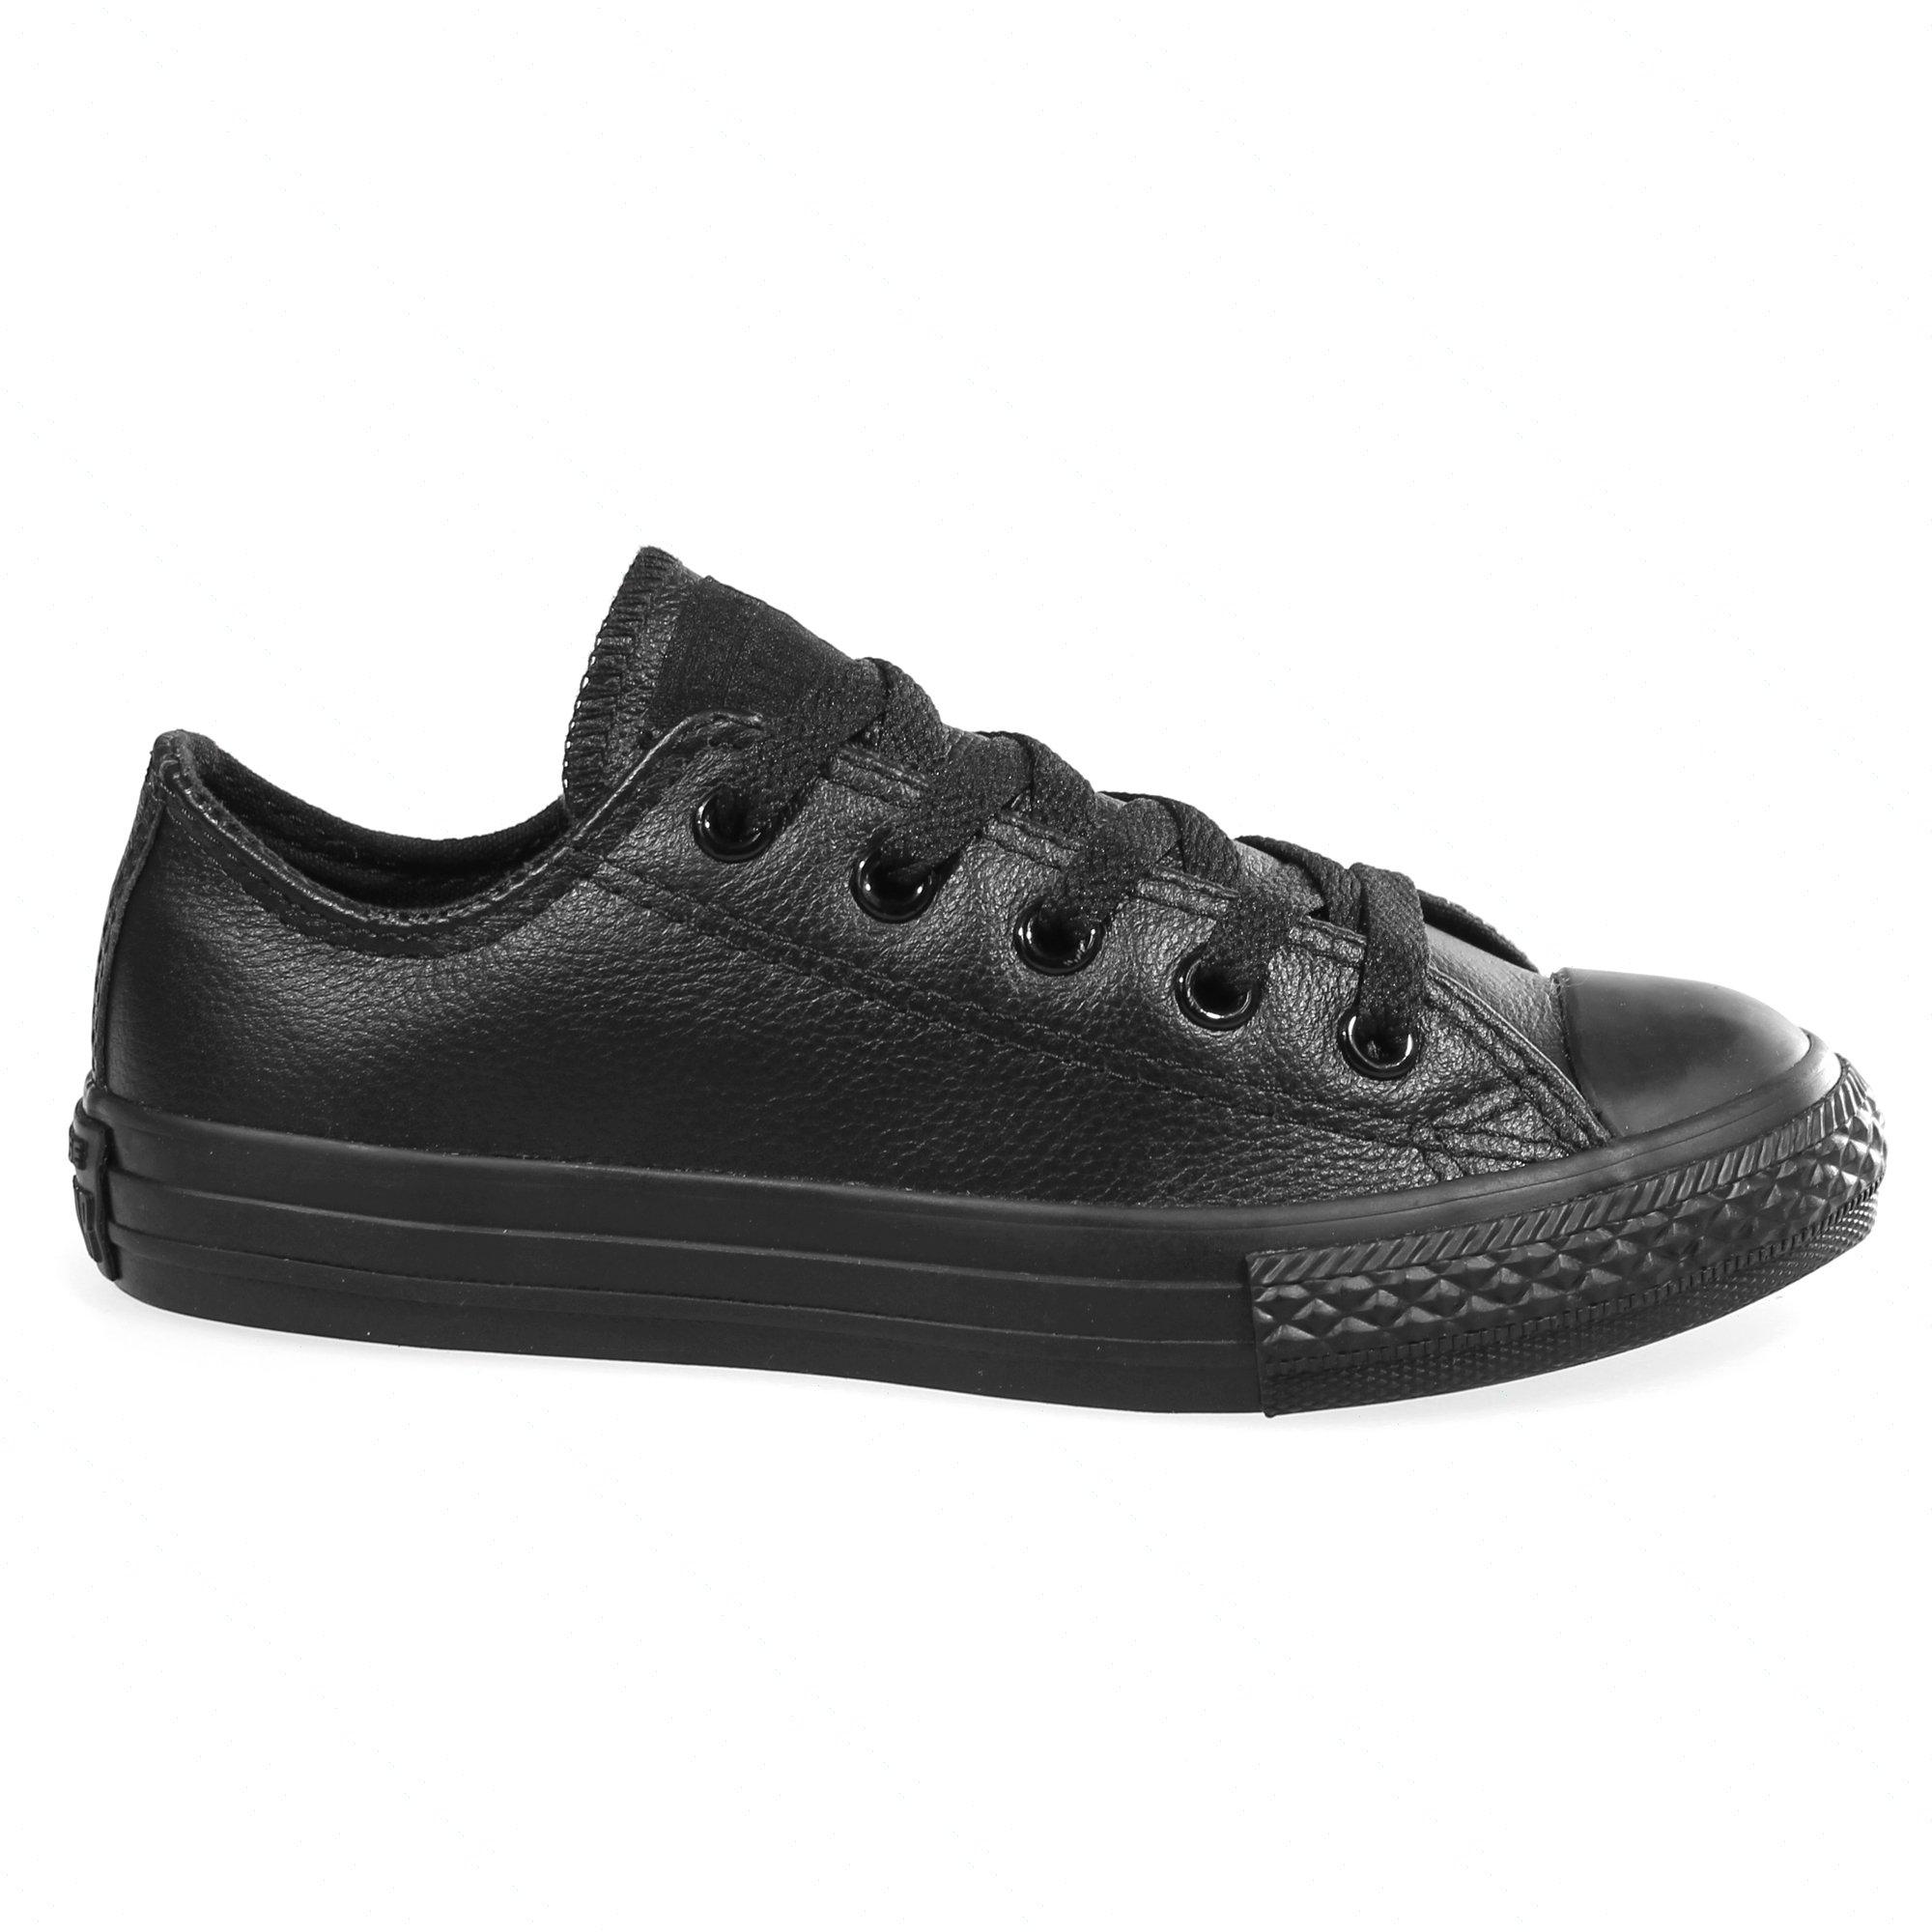 7d19f84d95e7ff Converse Unisex-Kinder Chuck Taylor Ct OX Sneakers